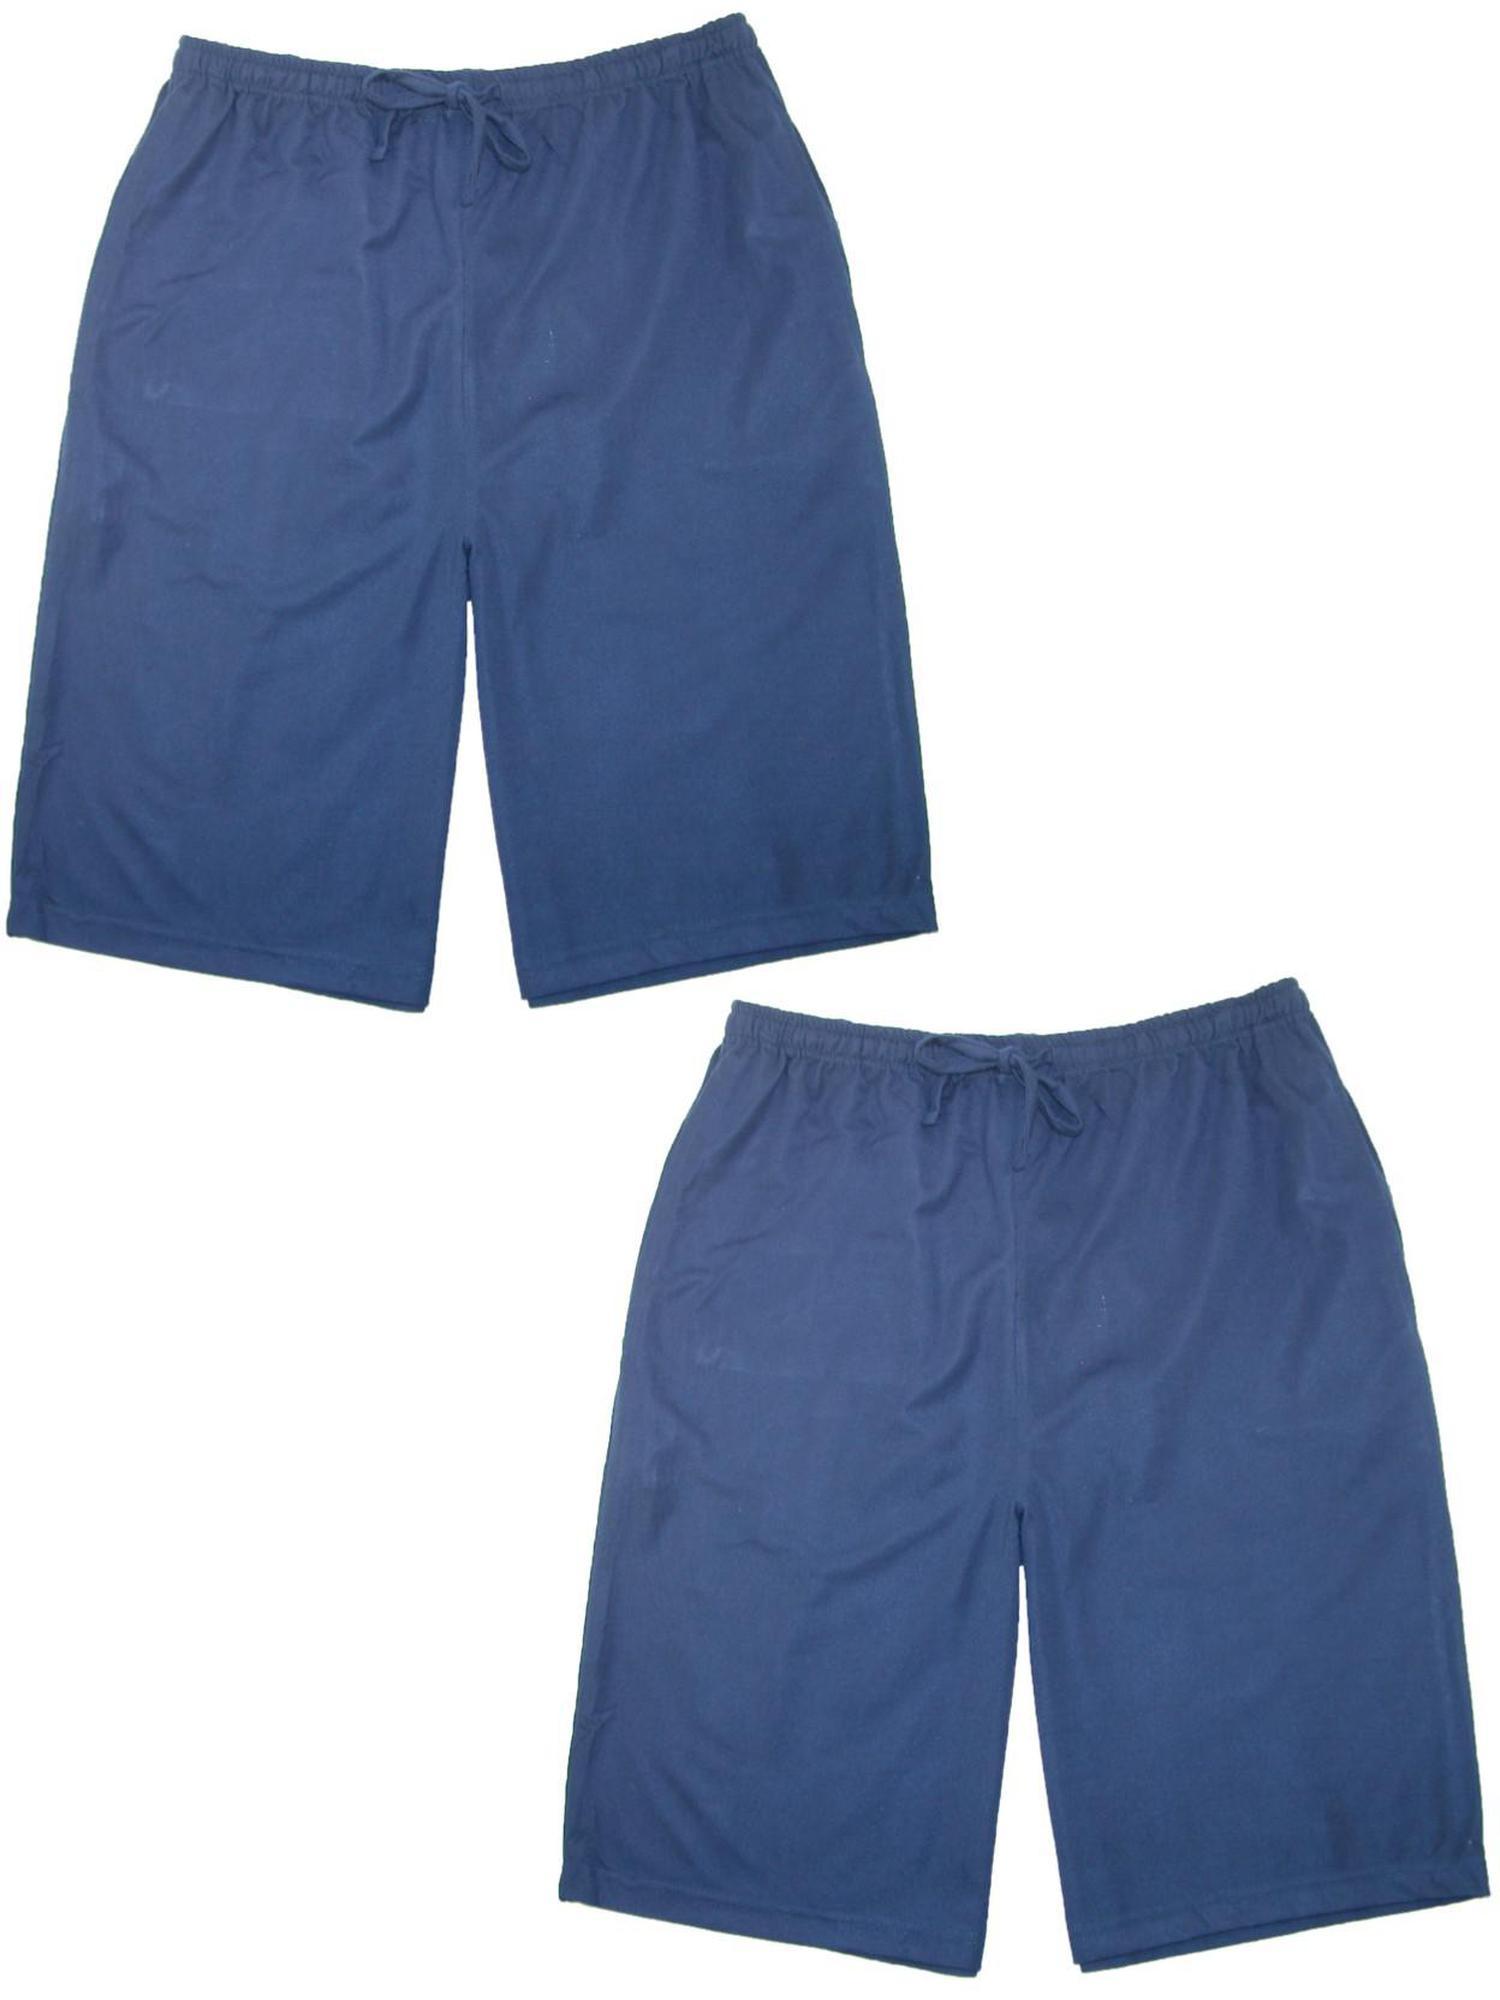 Ten West Apparel Men's Knit Sleep Shorts (Pack of 2)